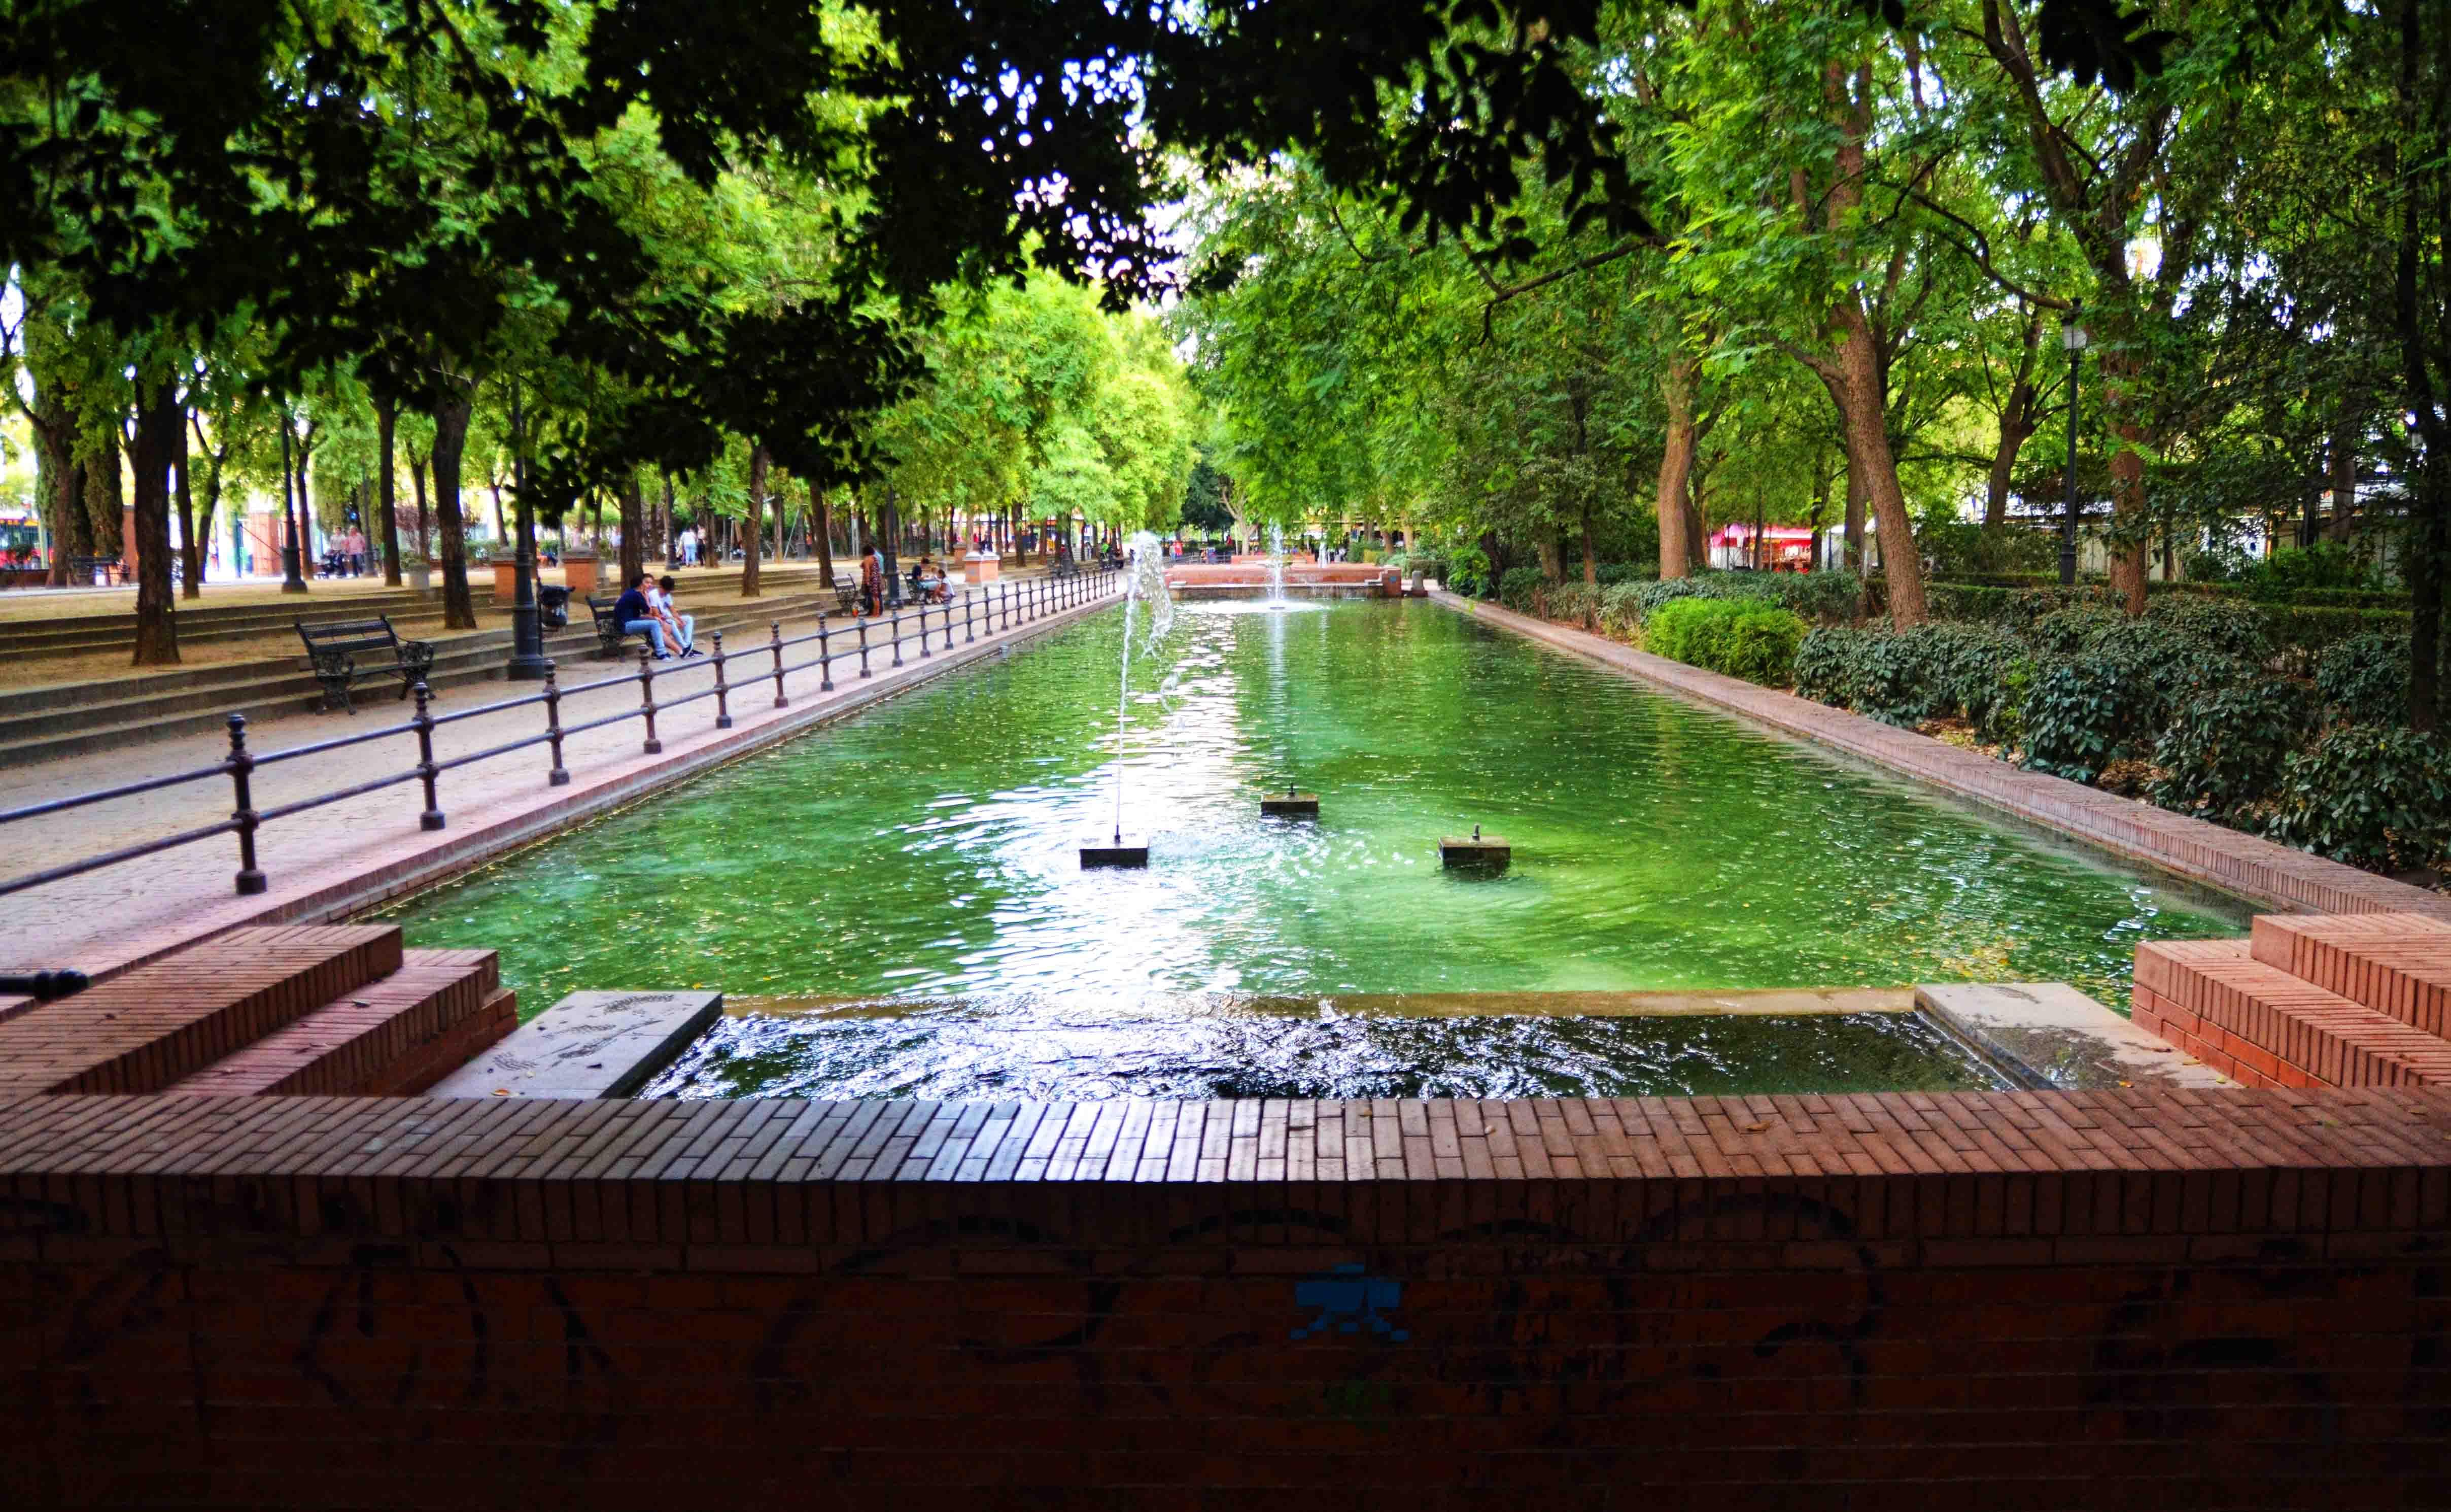 Prado de San Sebastian Park entrance.